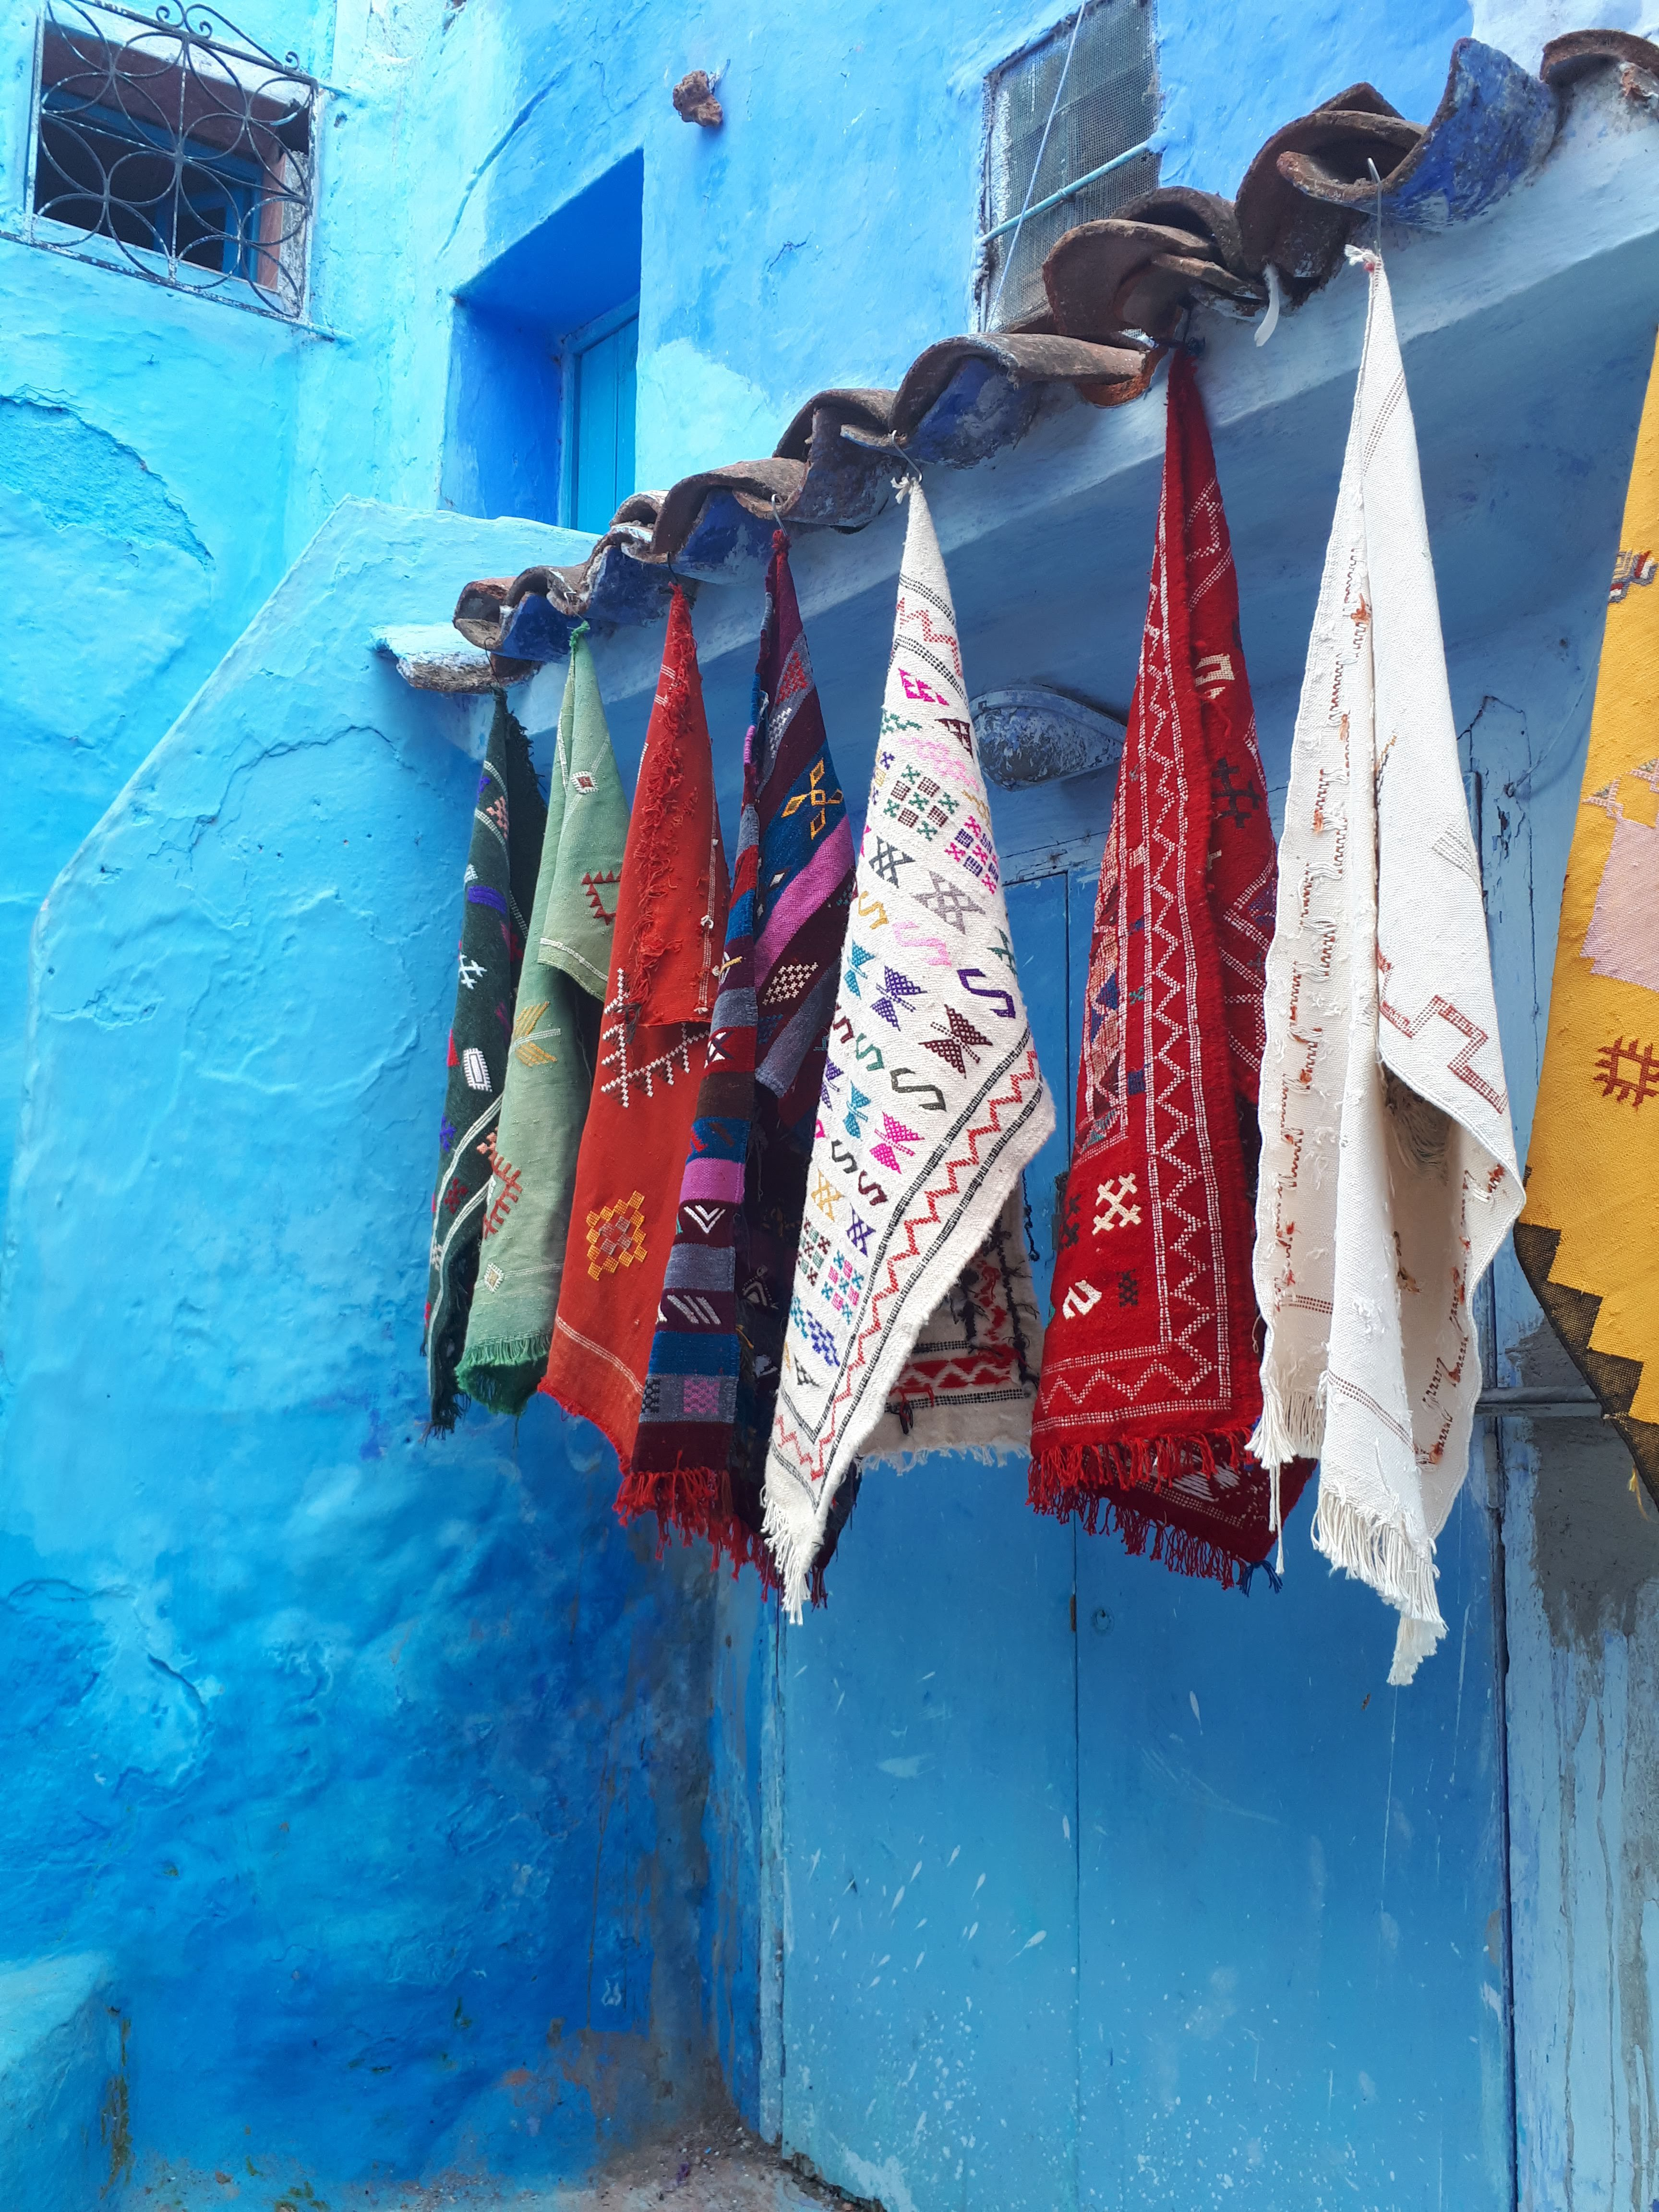 Chefchaouen - Roadtrip Girls in Morocco